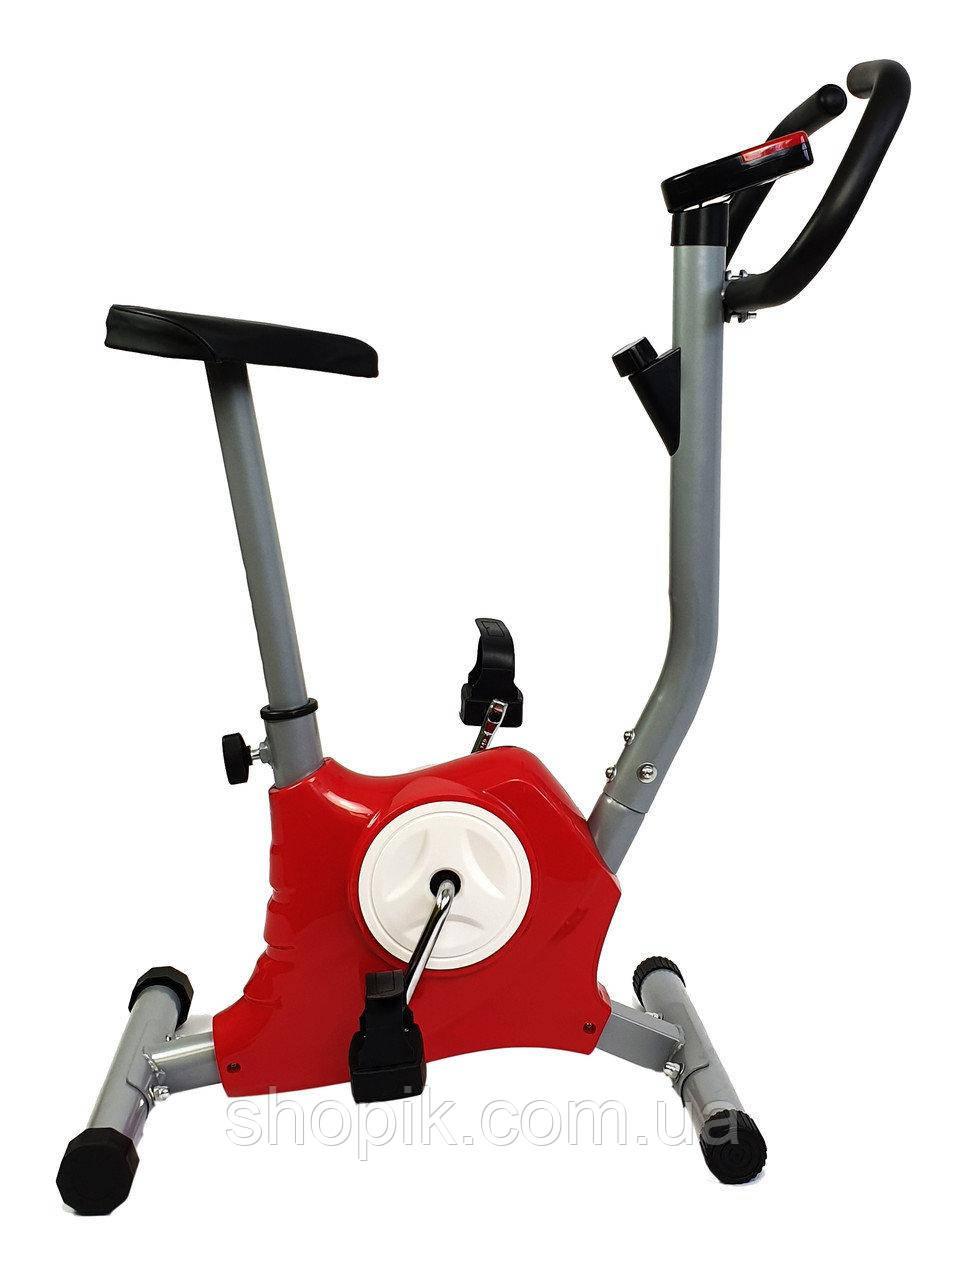 Велотренажер 7FIT T8018 Intenso Red SHOPIK